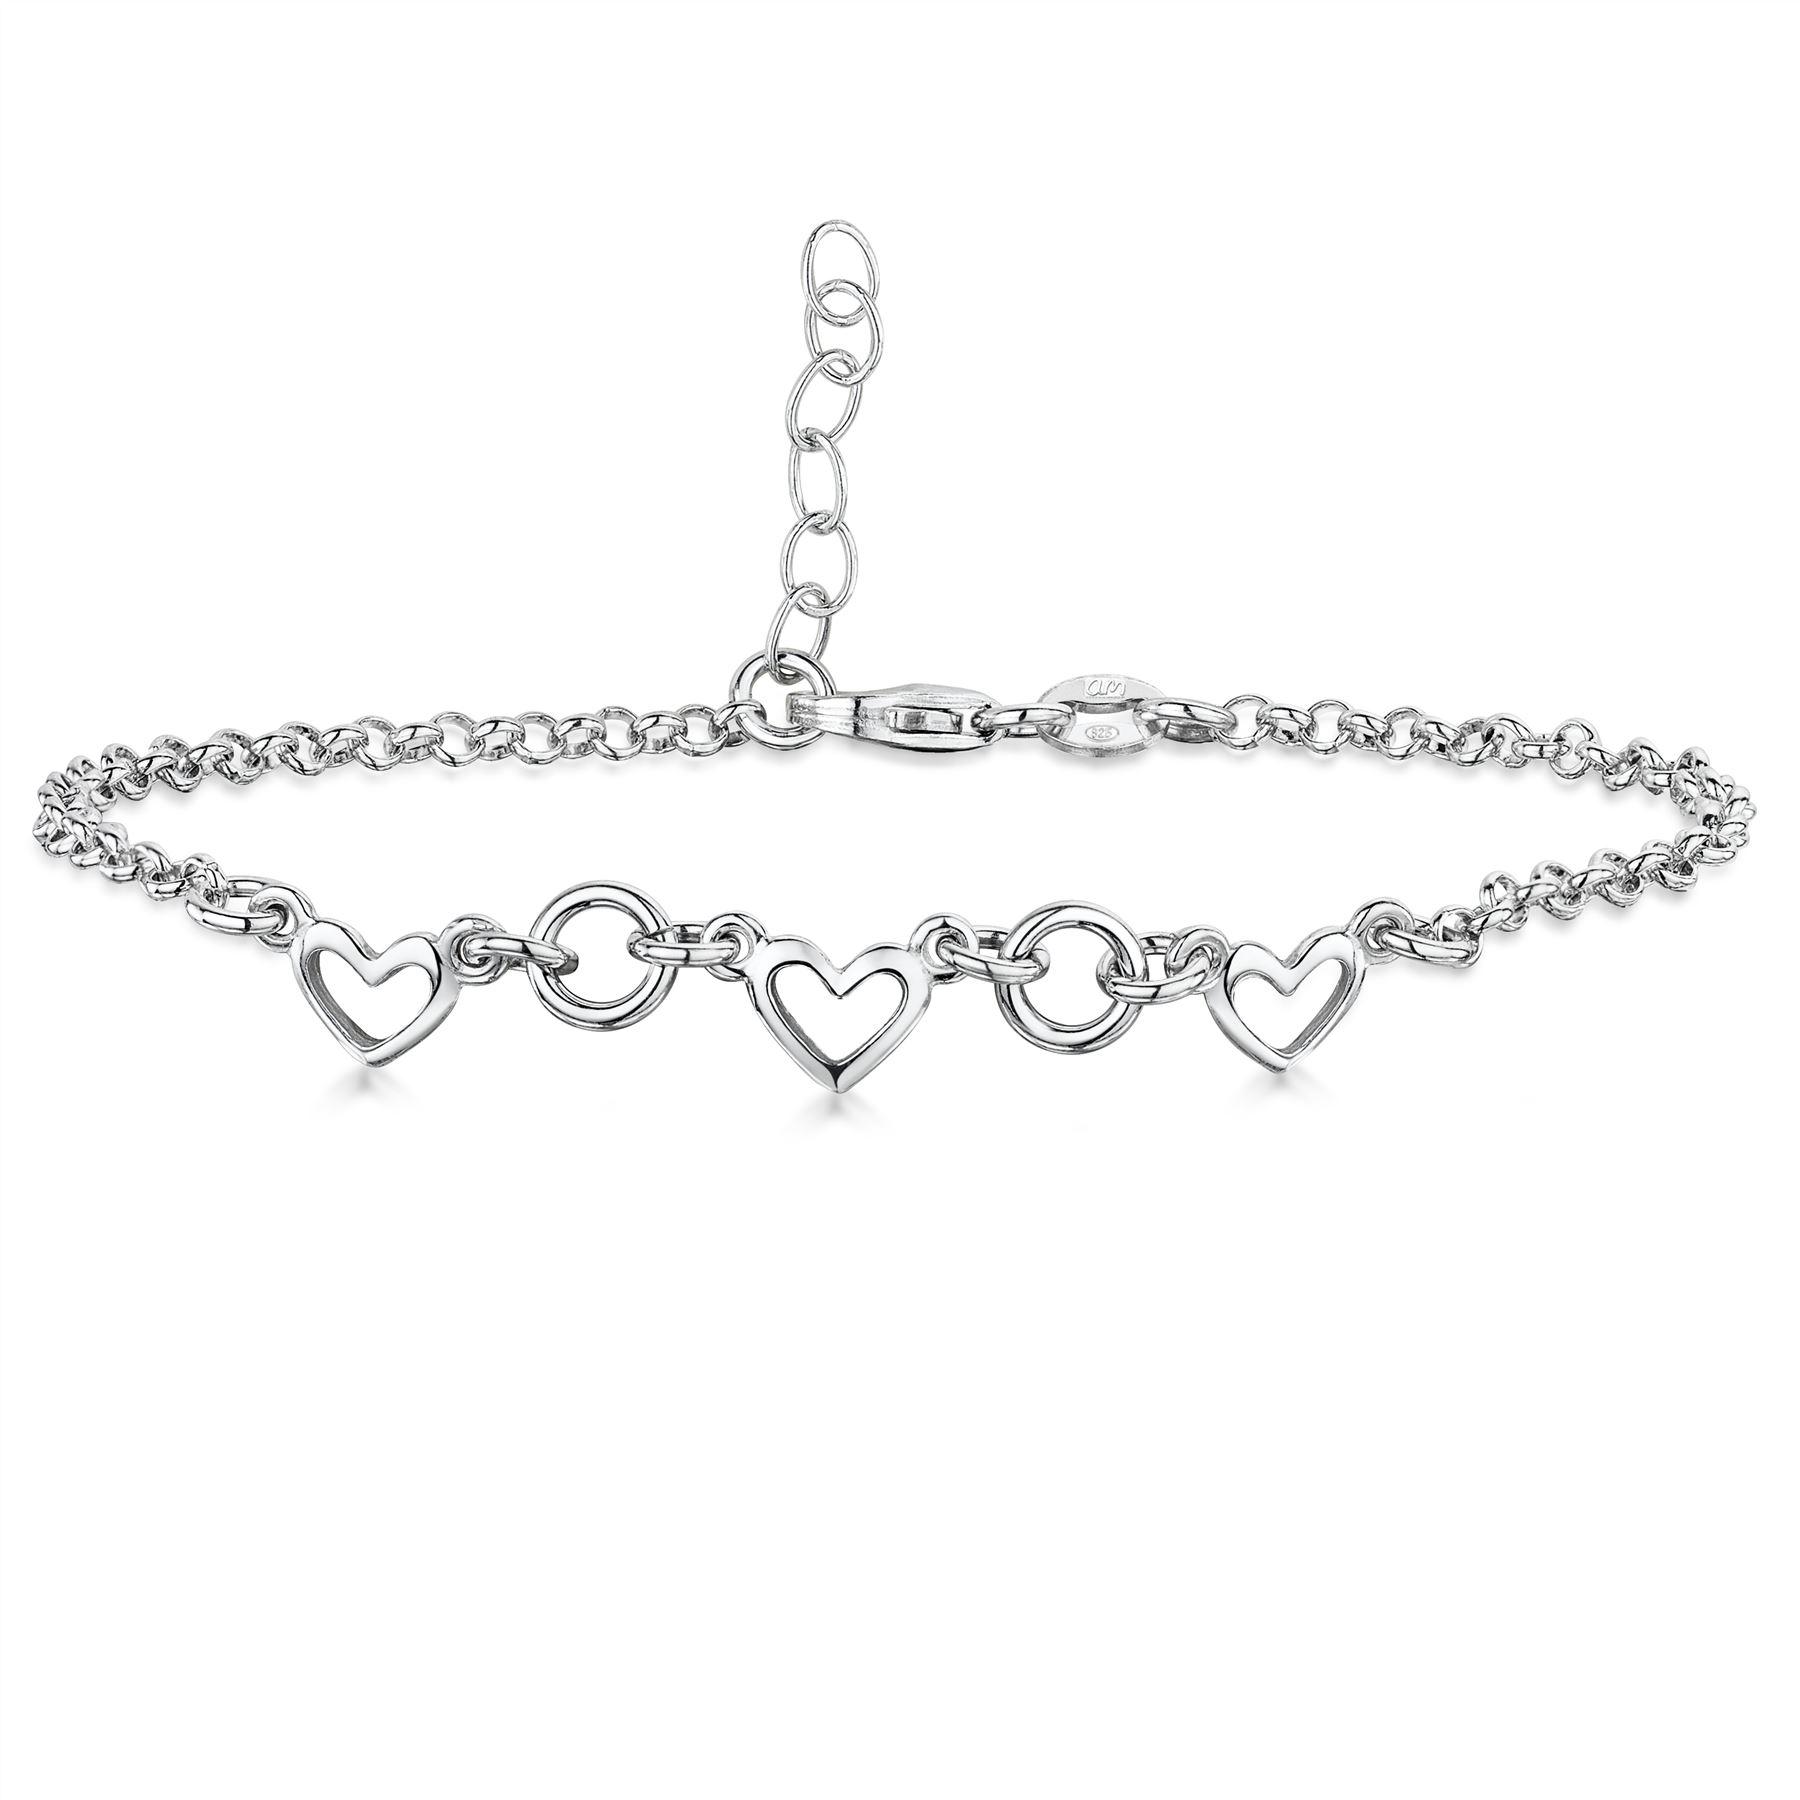 Amberta-Jewelry-925-Sterling-Silver-Adjustable-Bracelet-Italian-Bangle-for-Women miniature 63